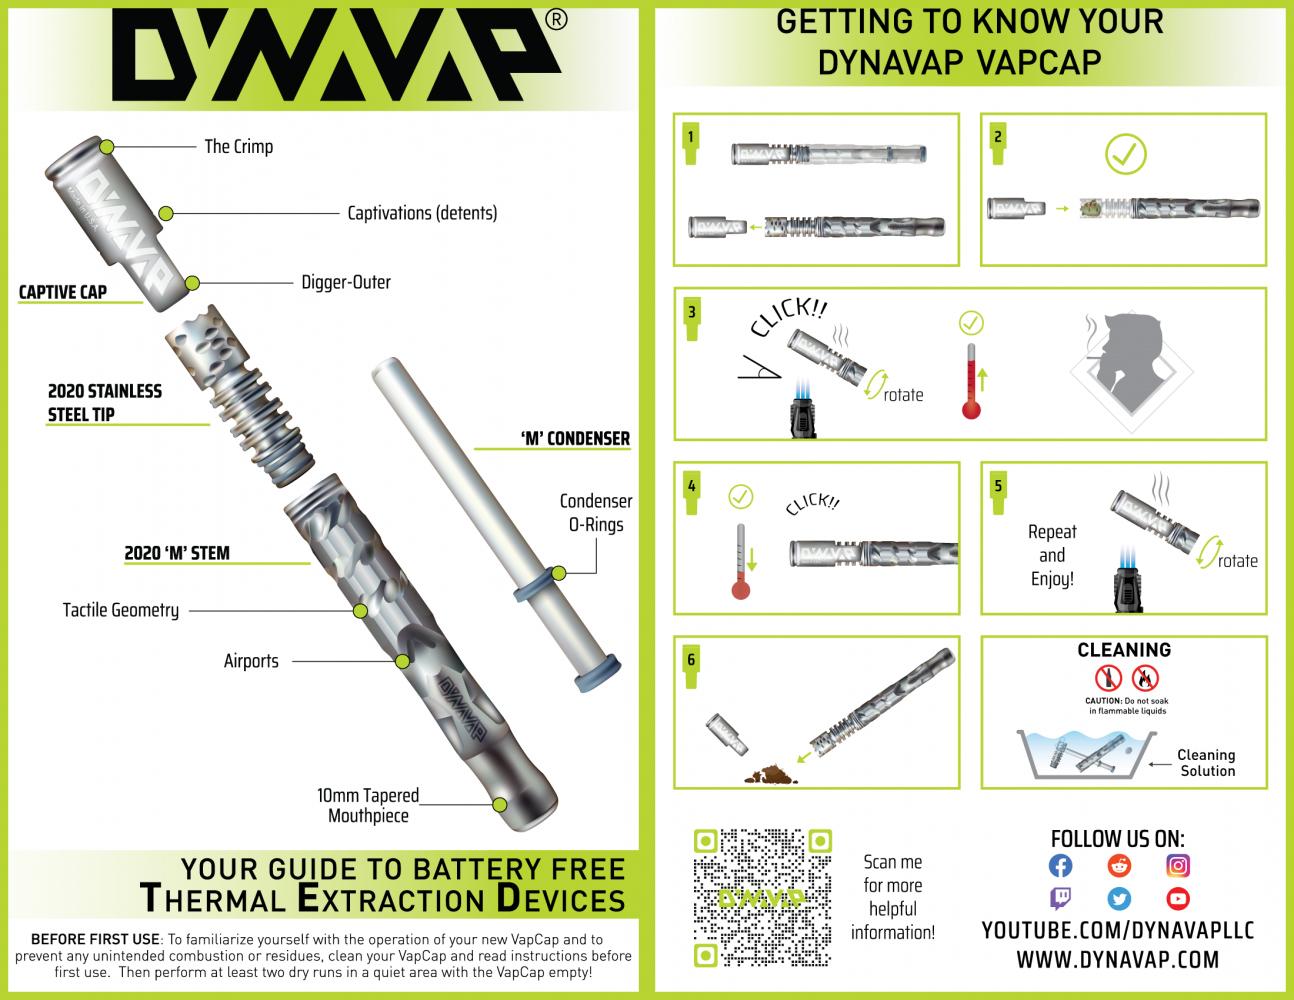 dynavap M2021 ダイナバップ スターターパック/本体のみ 選択可 アナログ ヴェポライザー 直火 加熱式タバコ コンダクション